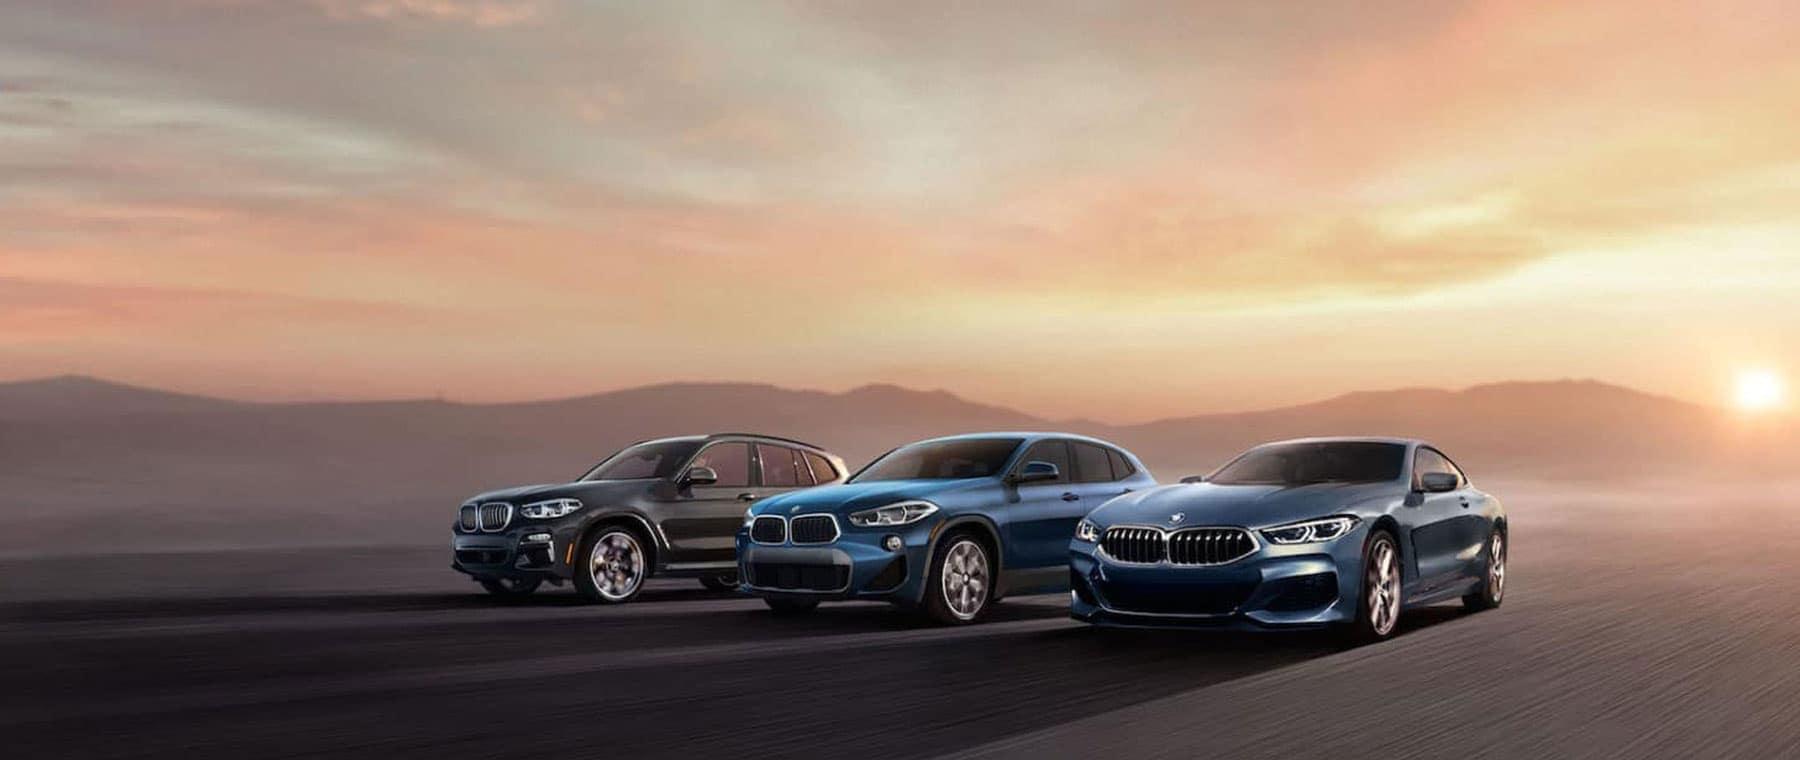 new-BMW_Unexplainable_Packshot-1800x760